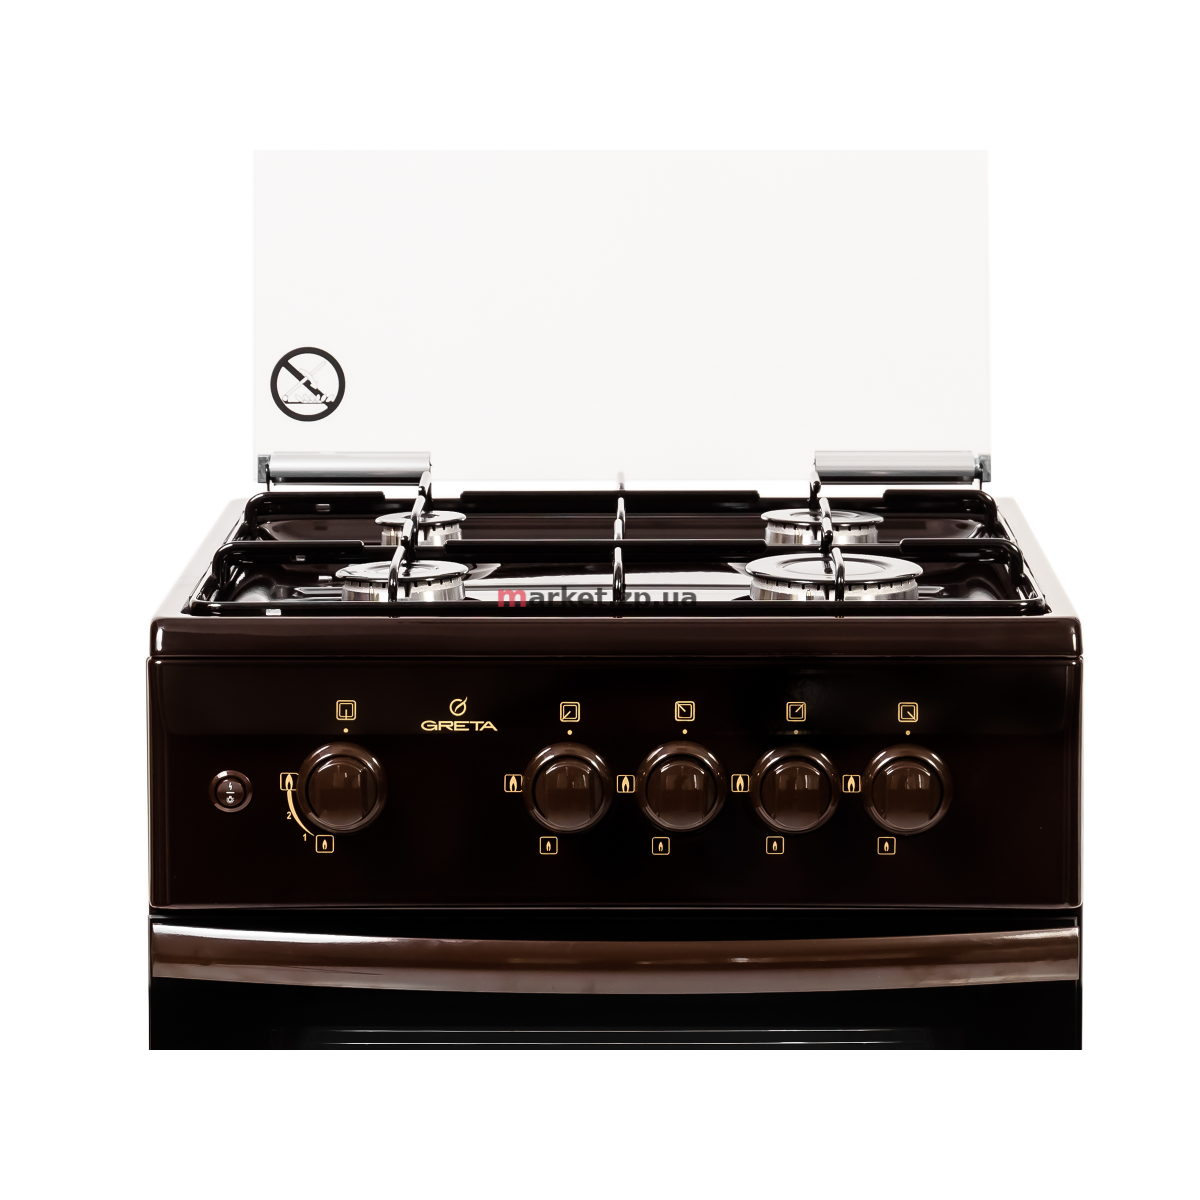 Плита GRETA 1470-07 aa (B) коричневая